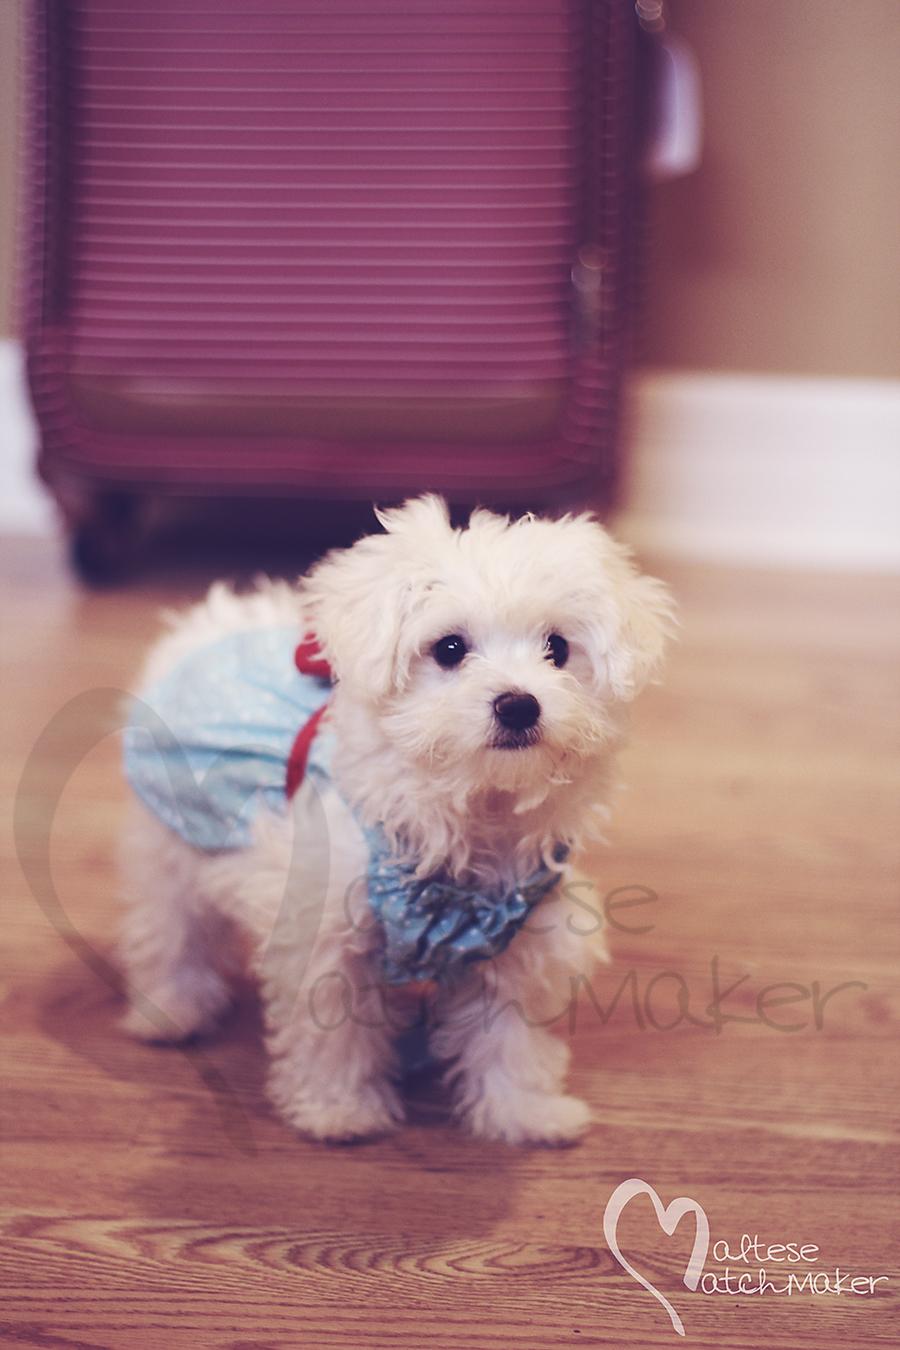 maltese puppy in dress on wood floor vertical